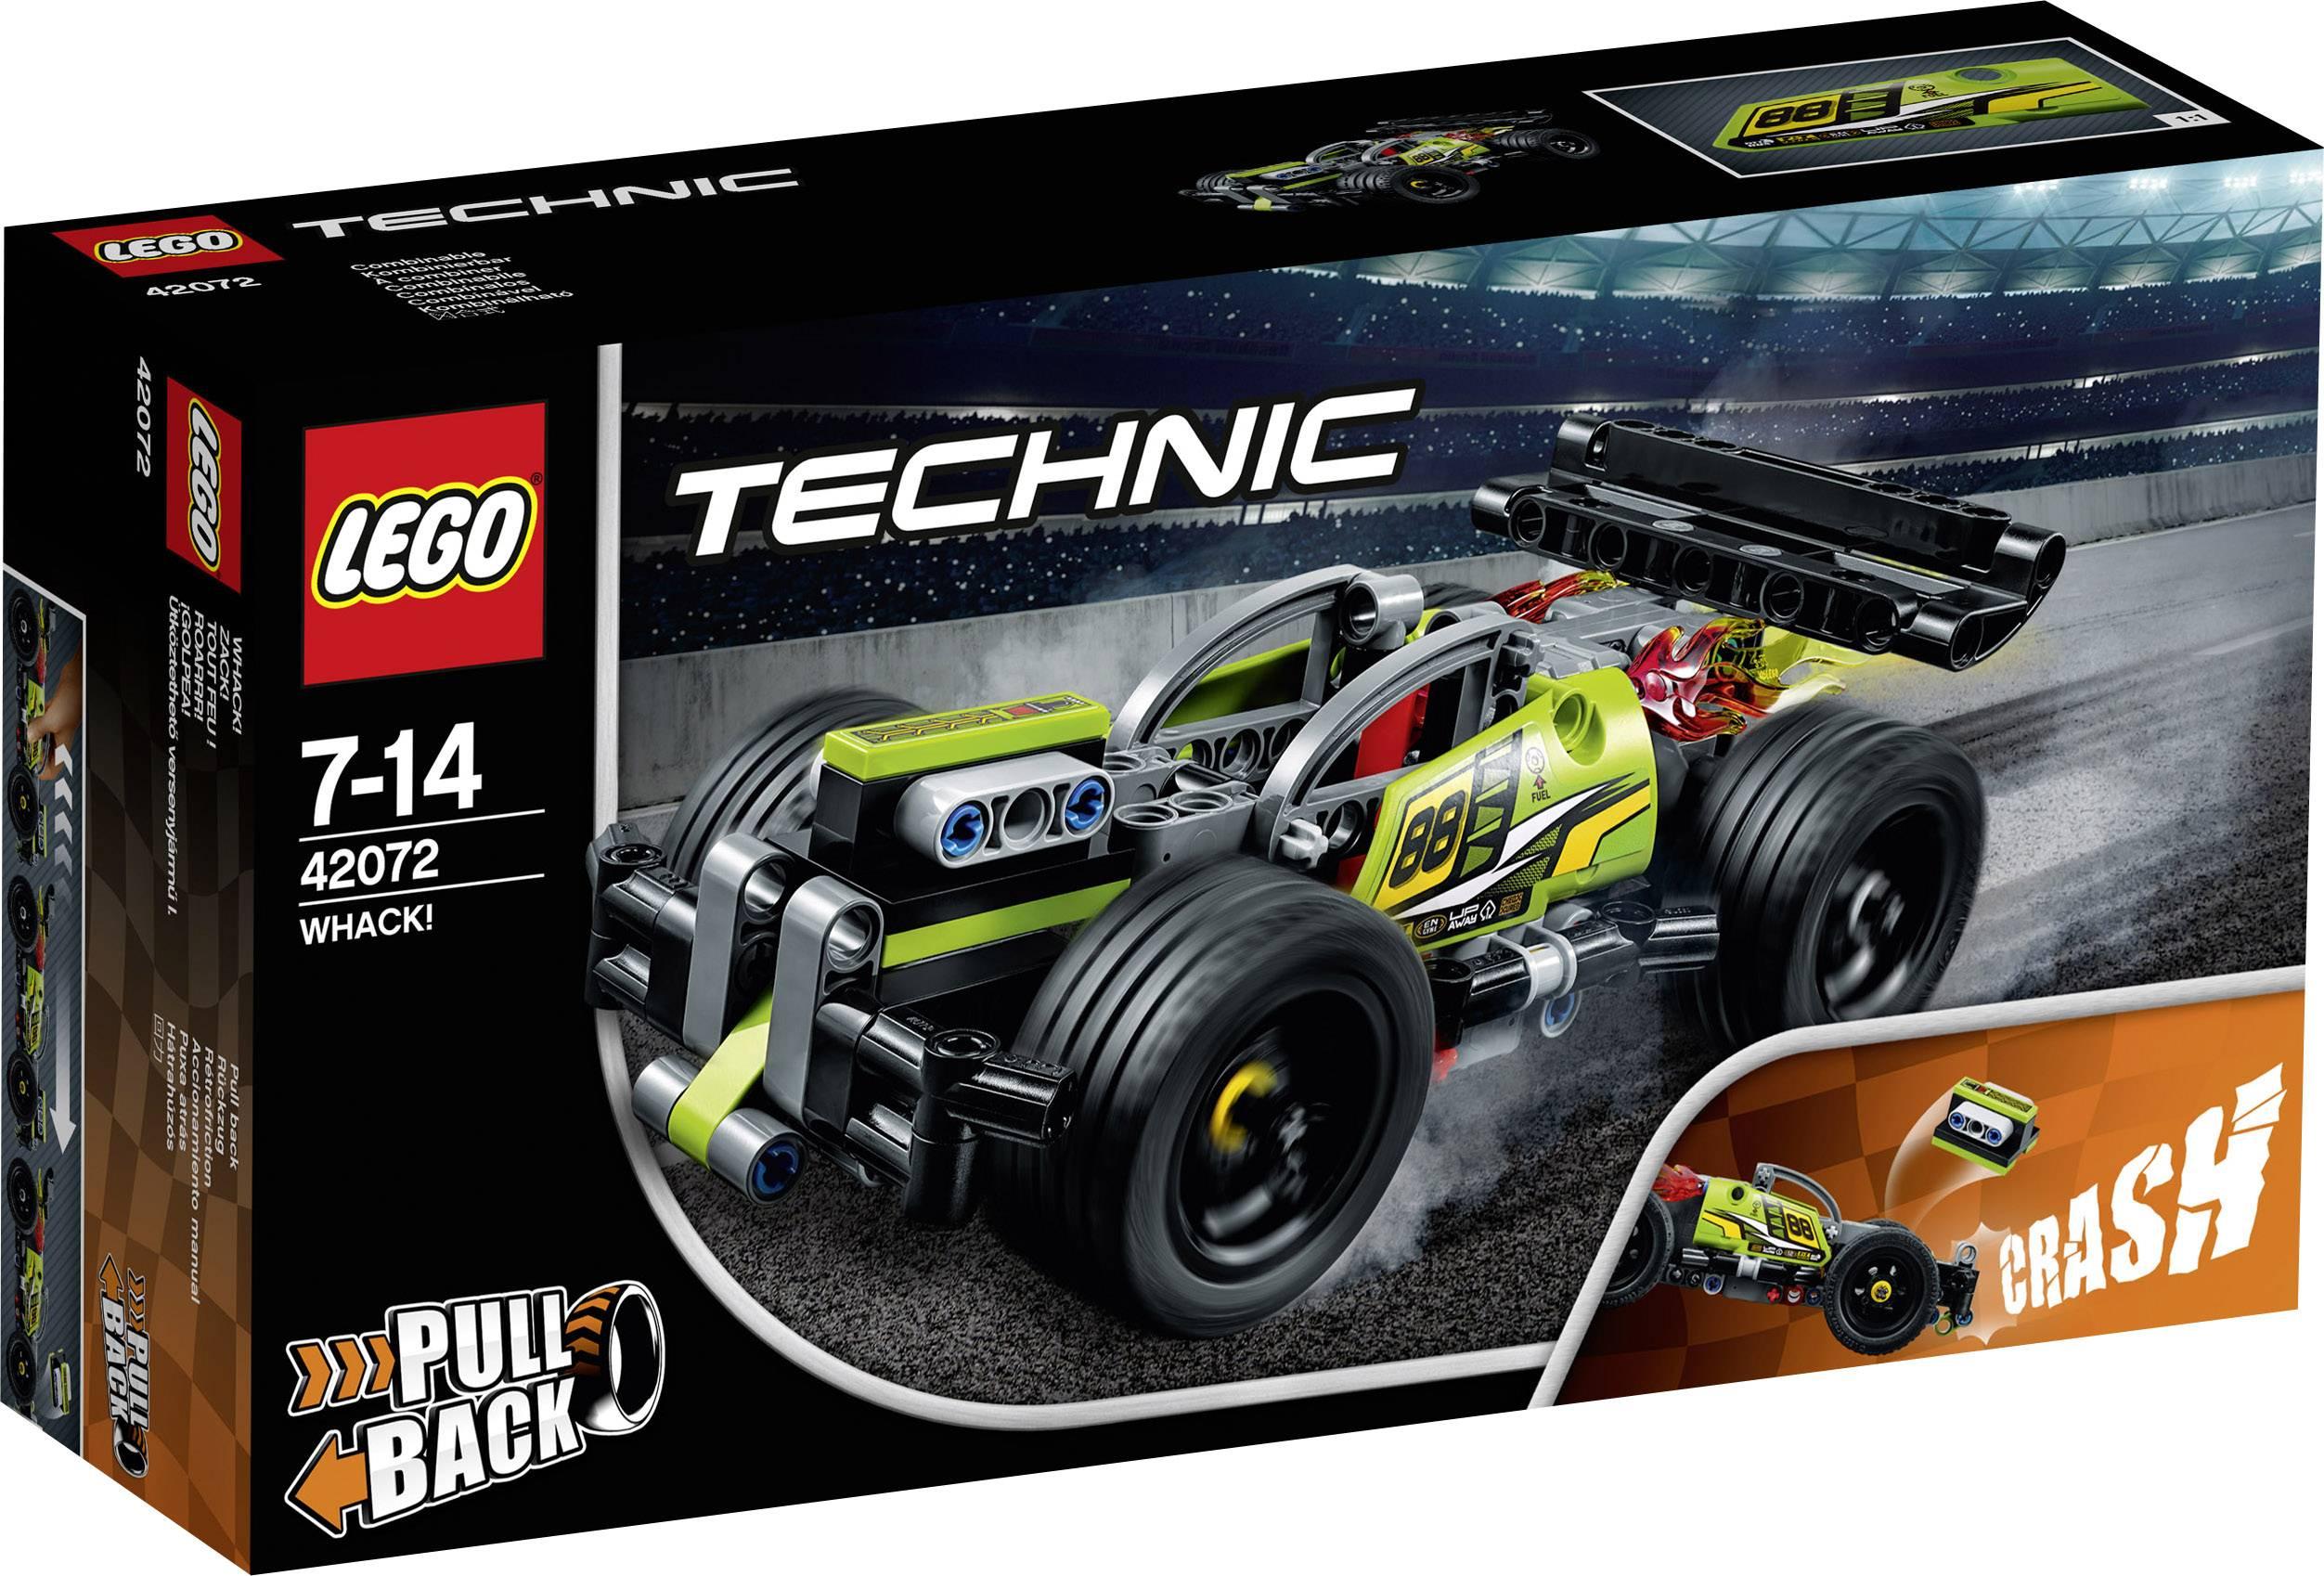 42072 ROARRR! LEGO Technic